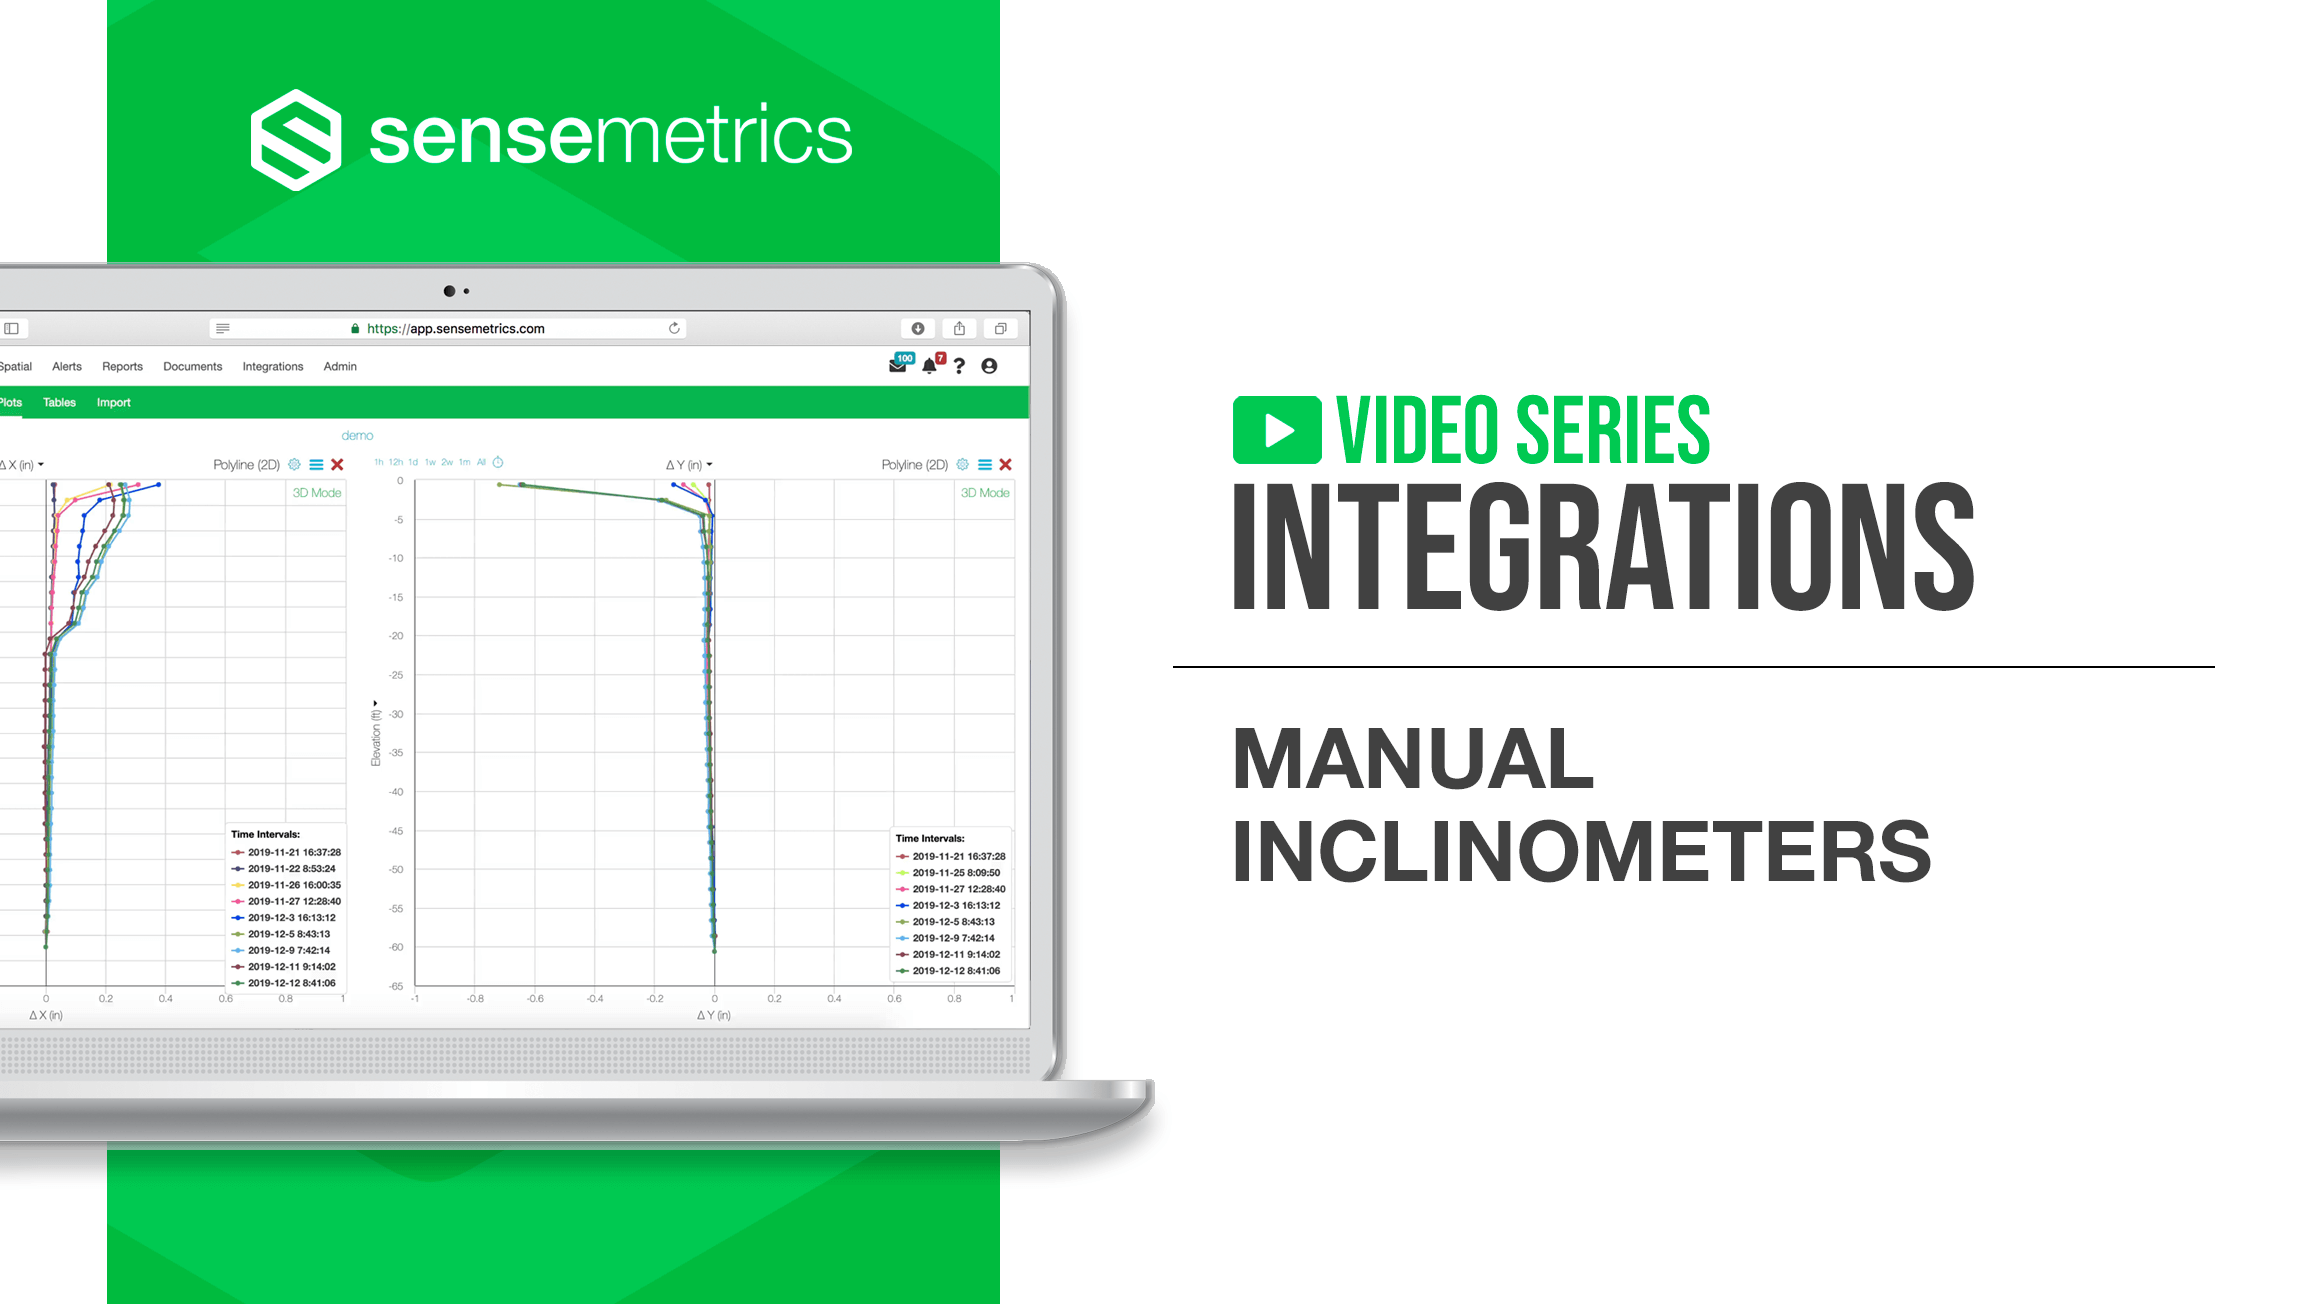 New Integration: Manual Inclinometers